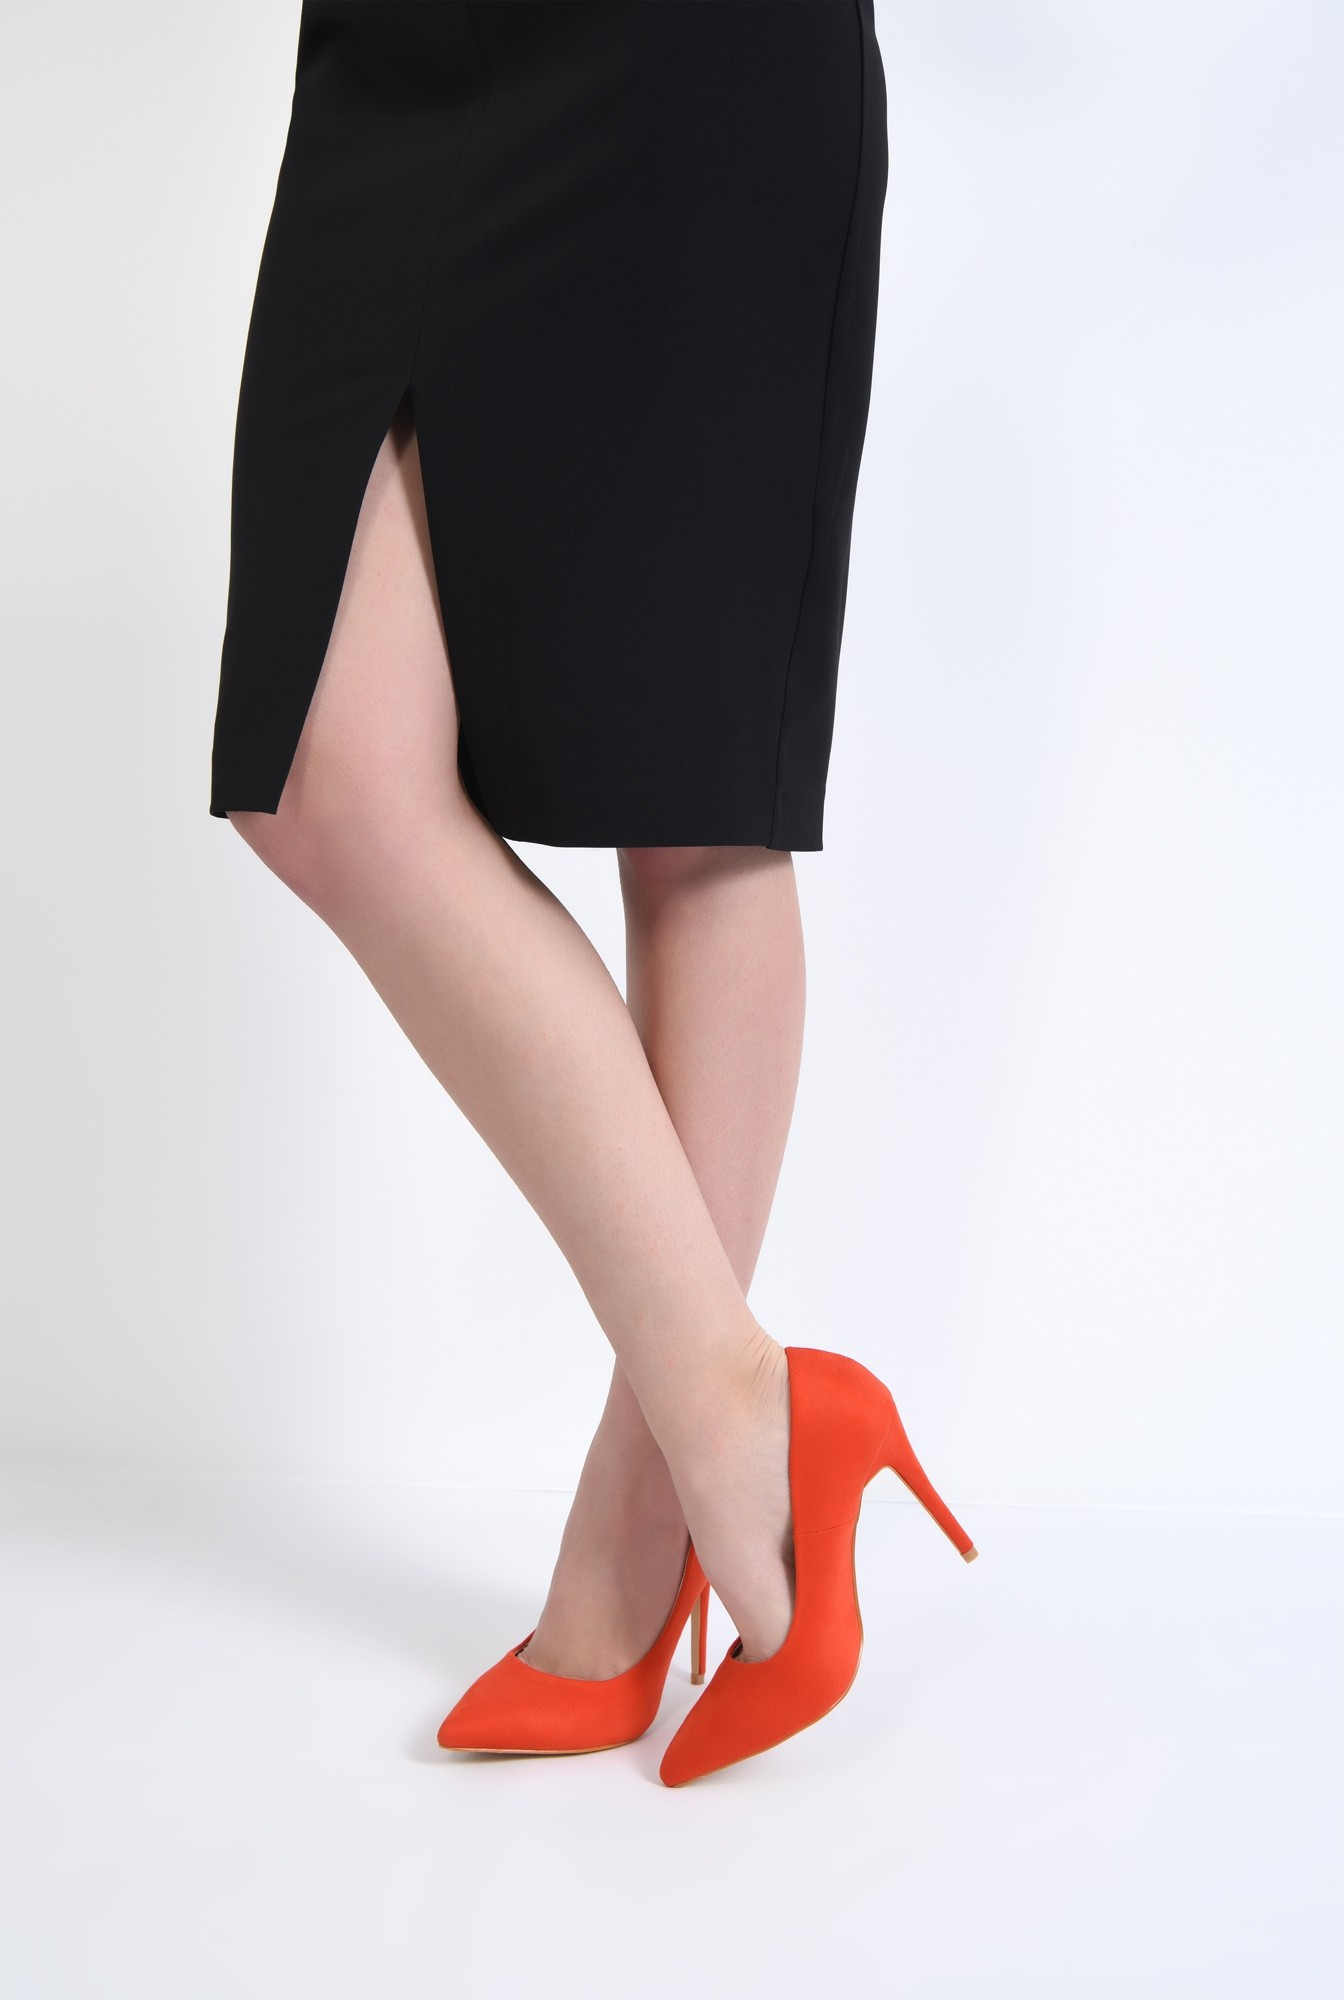 4 - pantofi casual, rosu, stiletto